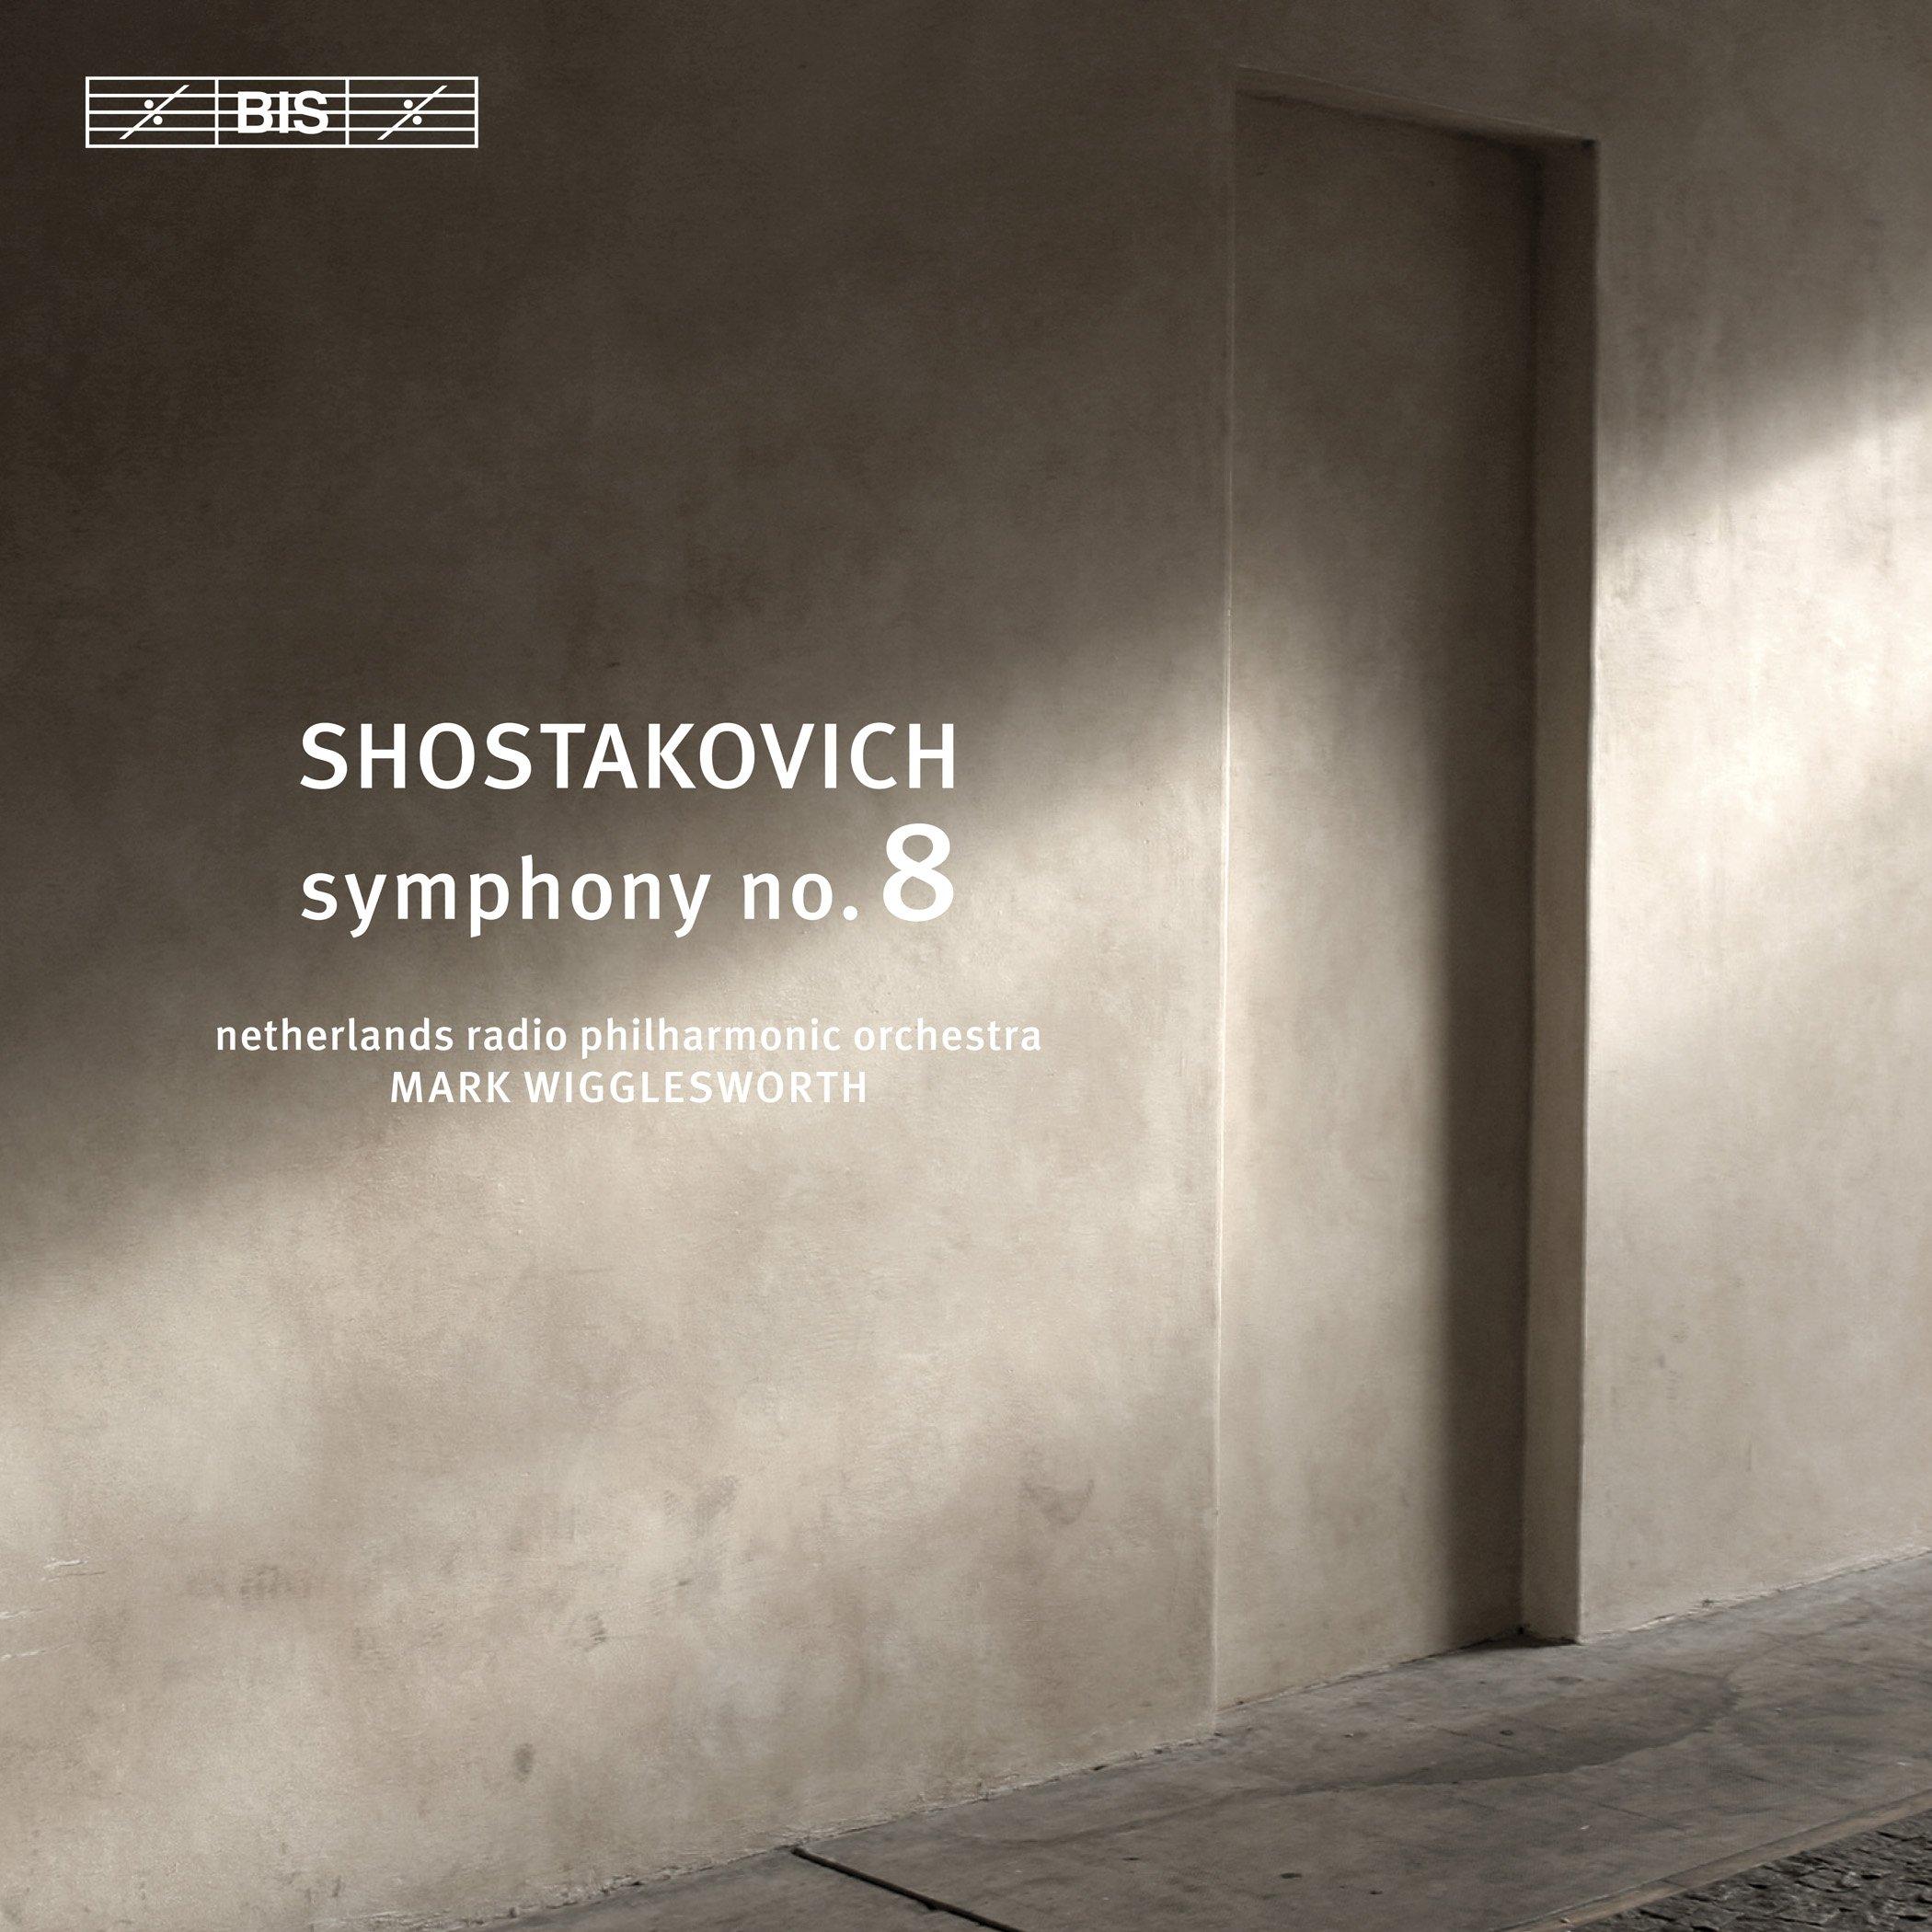 SACD : Mark Wigglesworth - Symphony 8 In C Minor (Hybrid SACD)